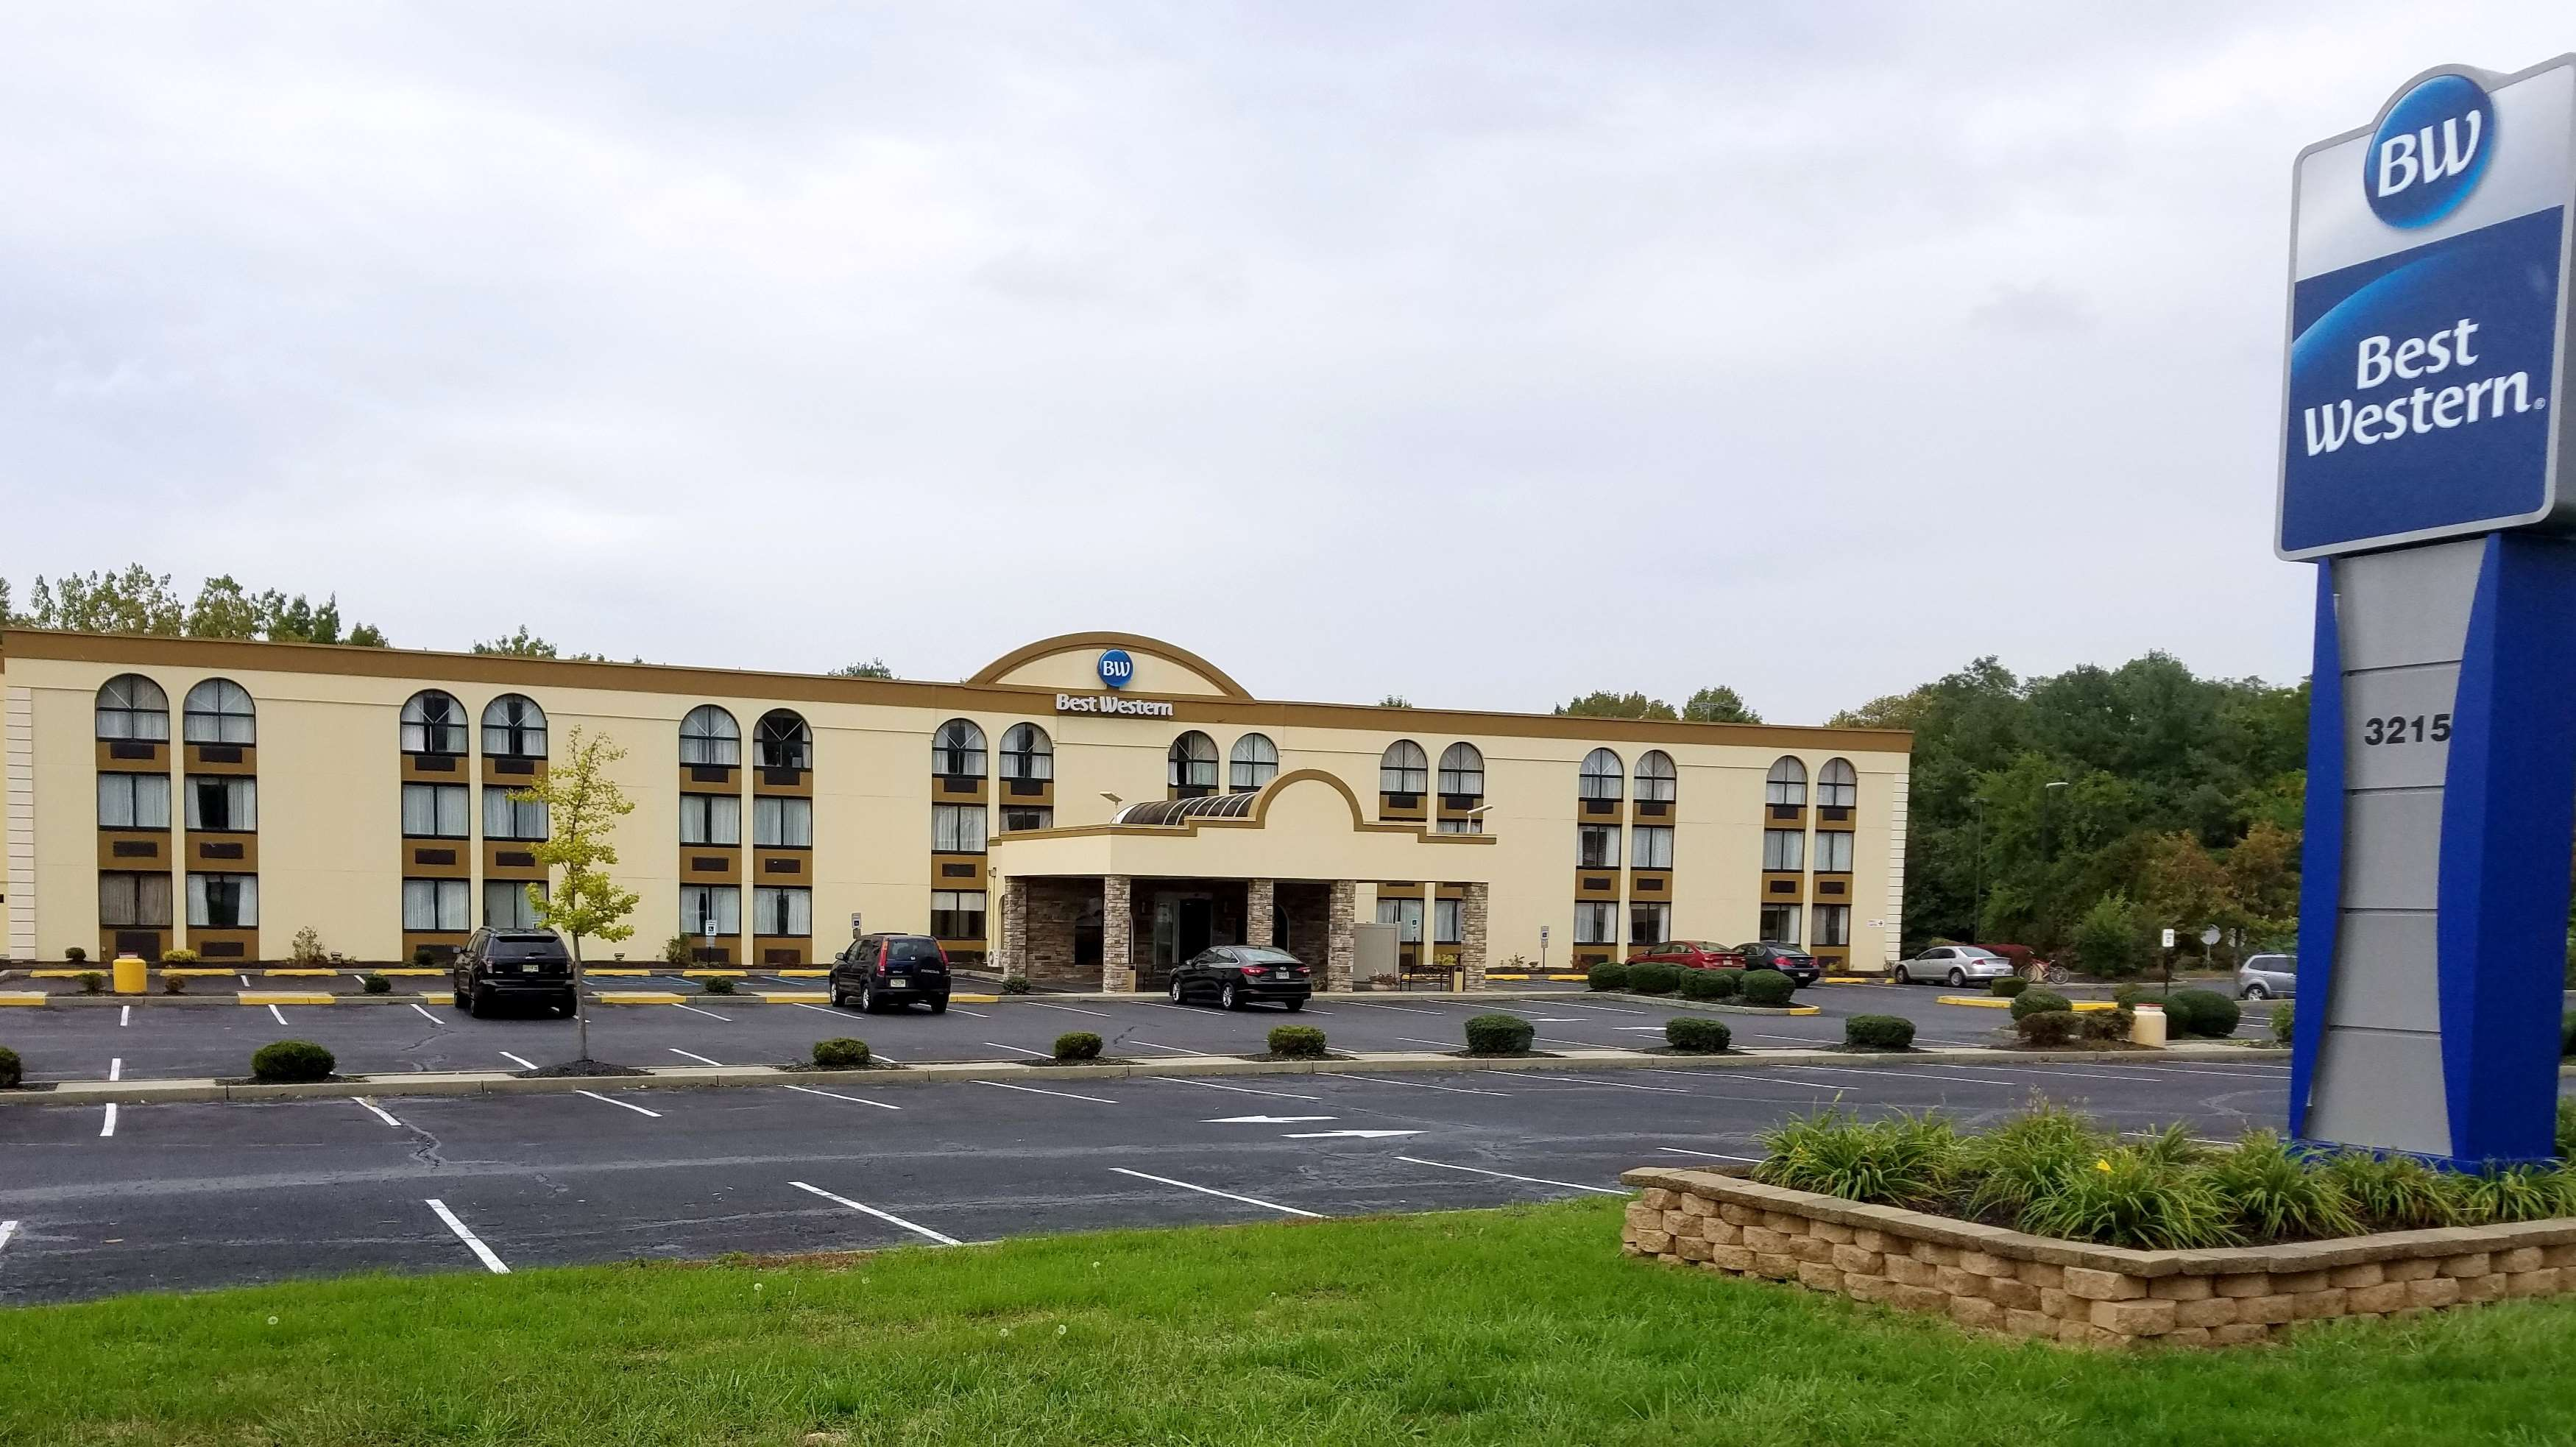 Best Western Hazlet Inn image 13